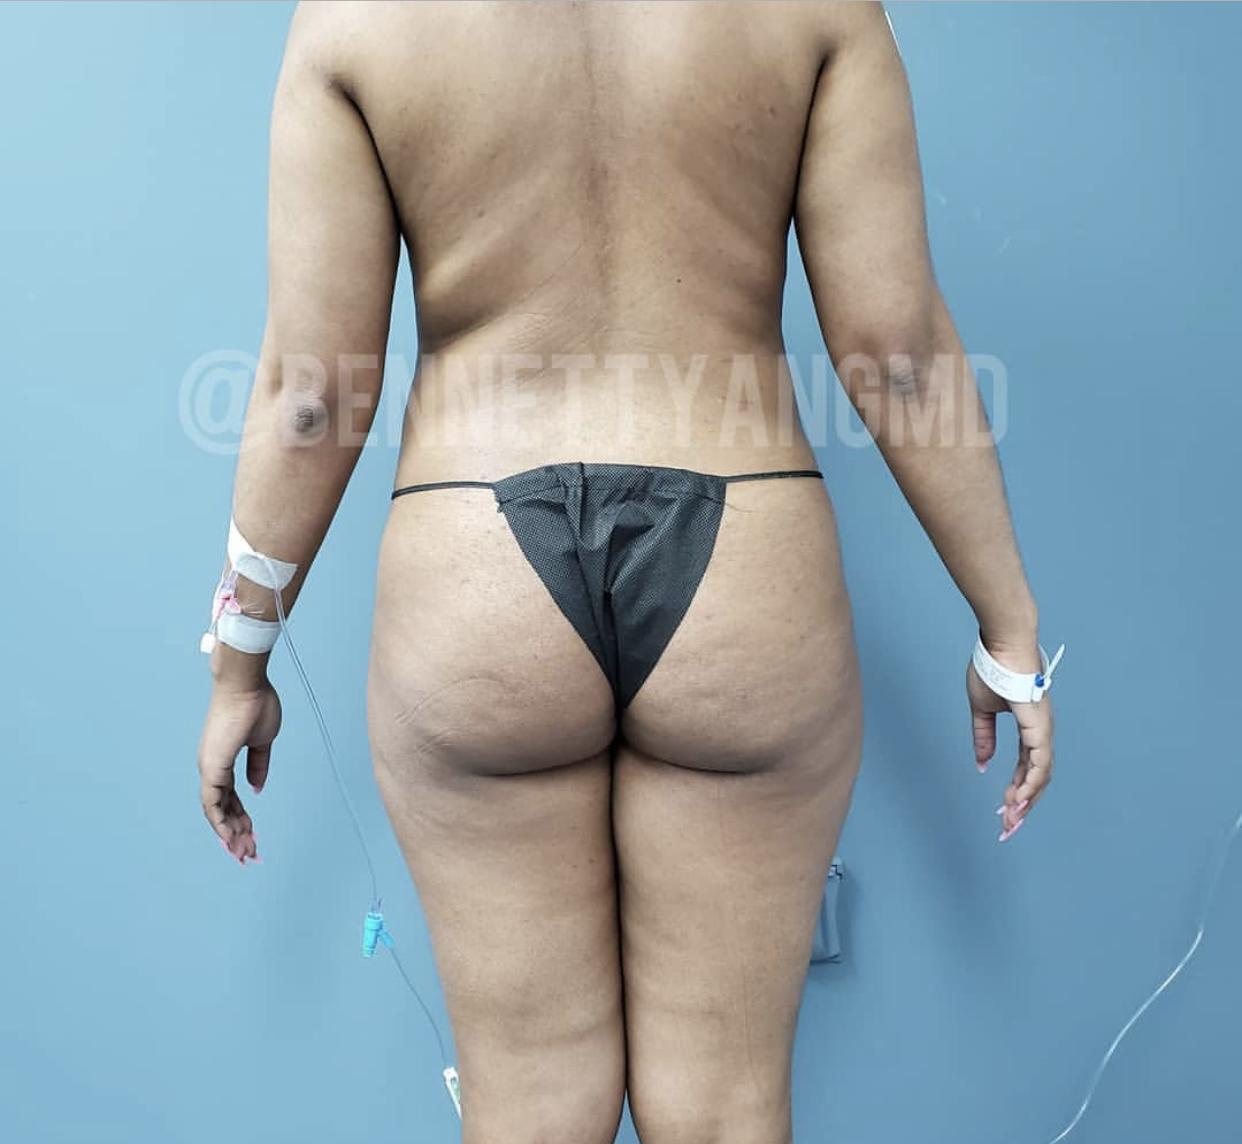 DMV BBL Plastic Surgeon, Brazilian Butt Lift Top Surgeon Maryland